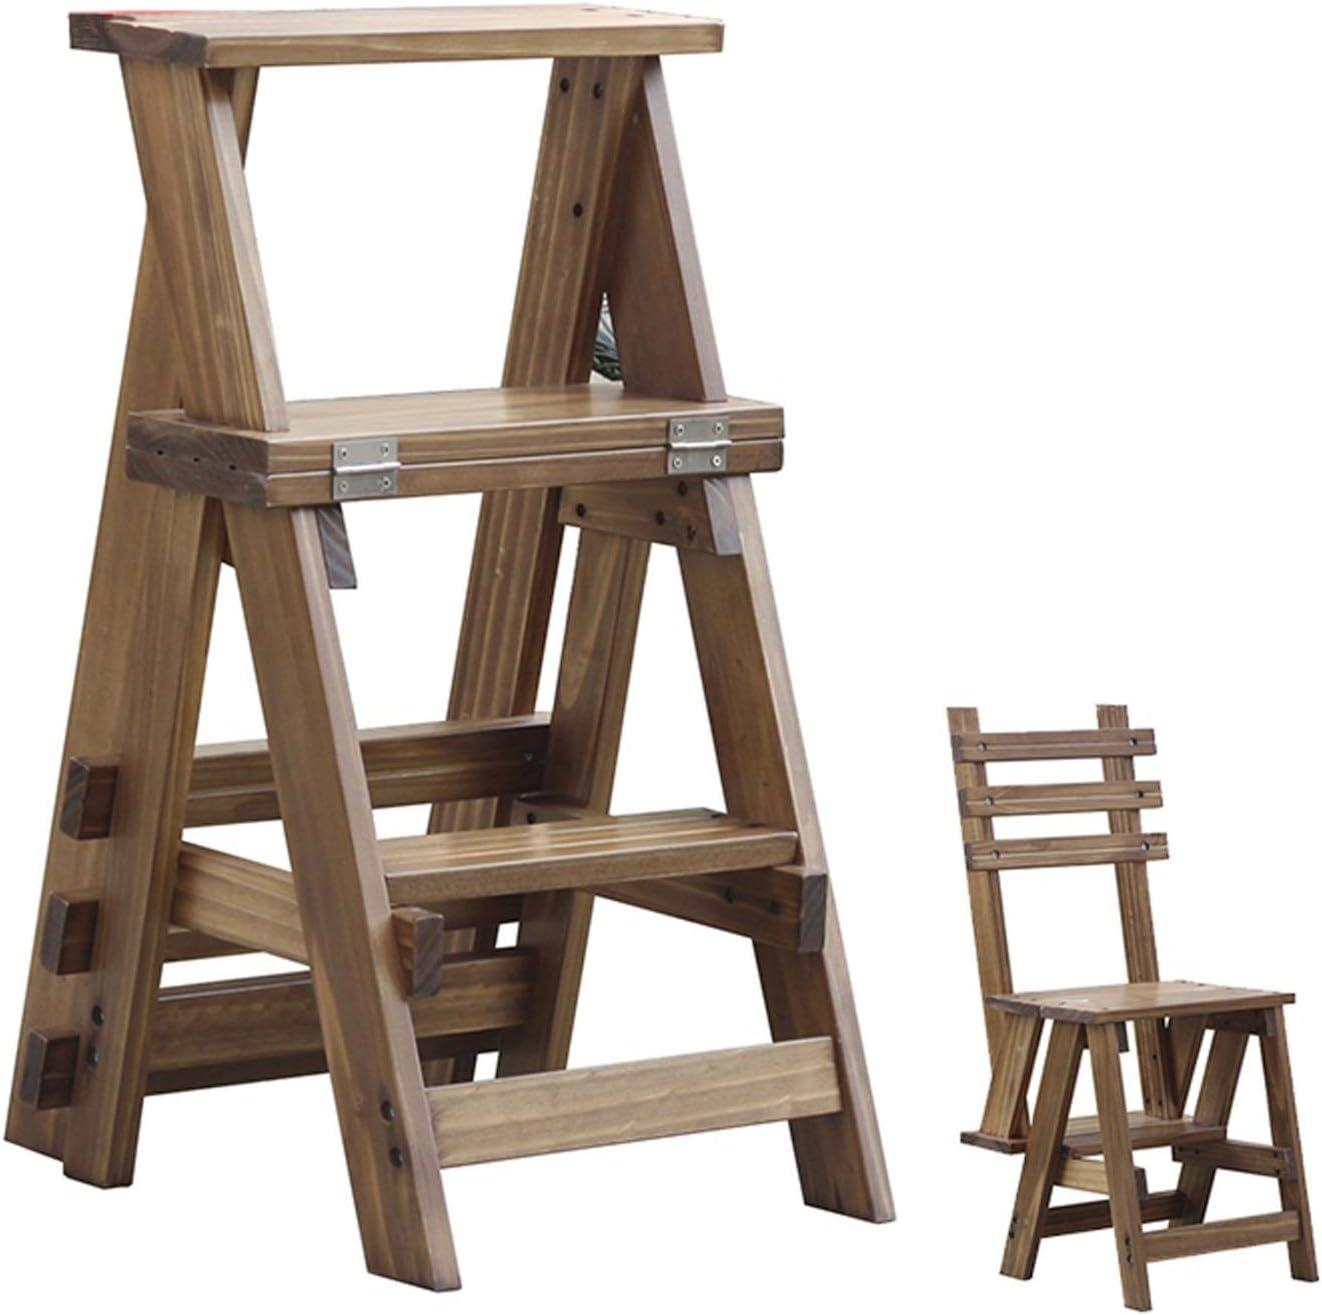 GAOJIAN Madera sólida escalera plegable de tres capas multifuncional taburete alto escalera escalera taburete hogar pequeña escalera de madera maciza de doble uso escalera plegable madera escalera: Amazon.es: Hogar